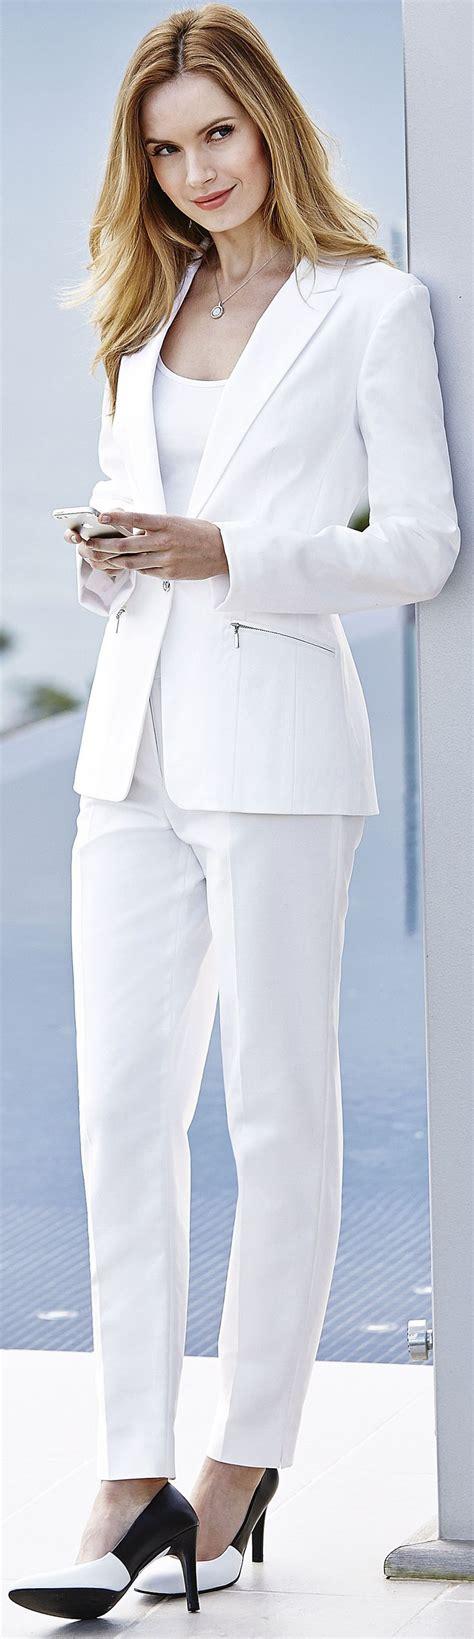 tall white linen pin by tina boomerina baby boomer on wedding